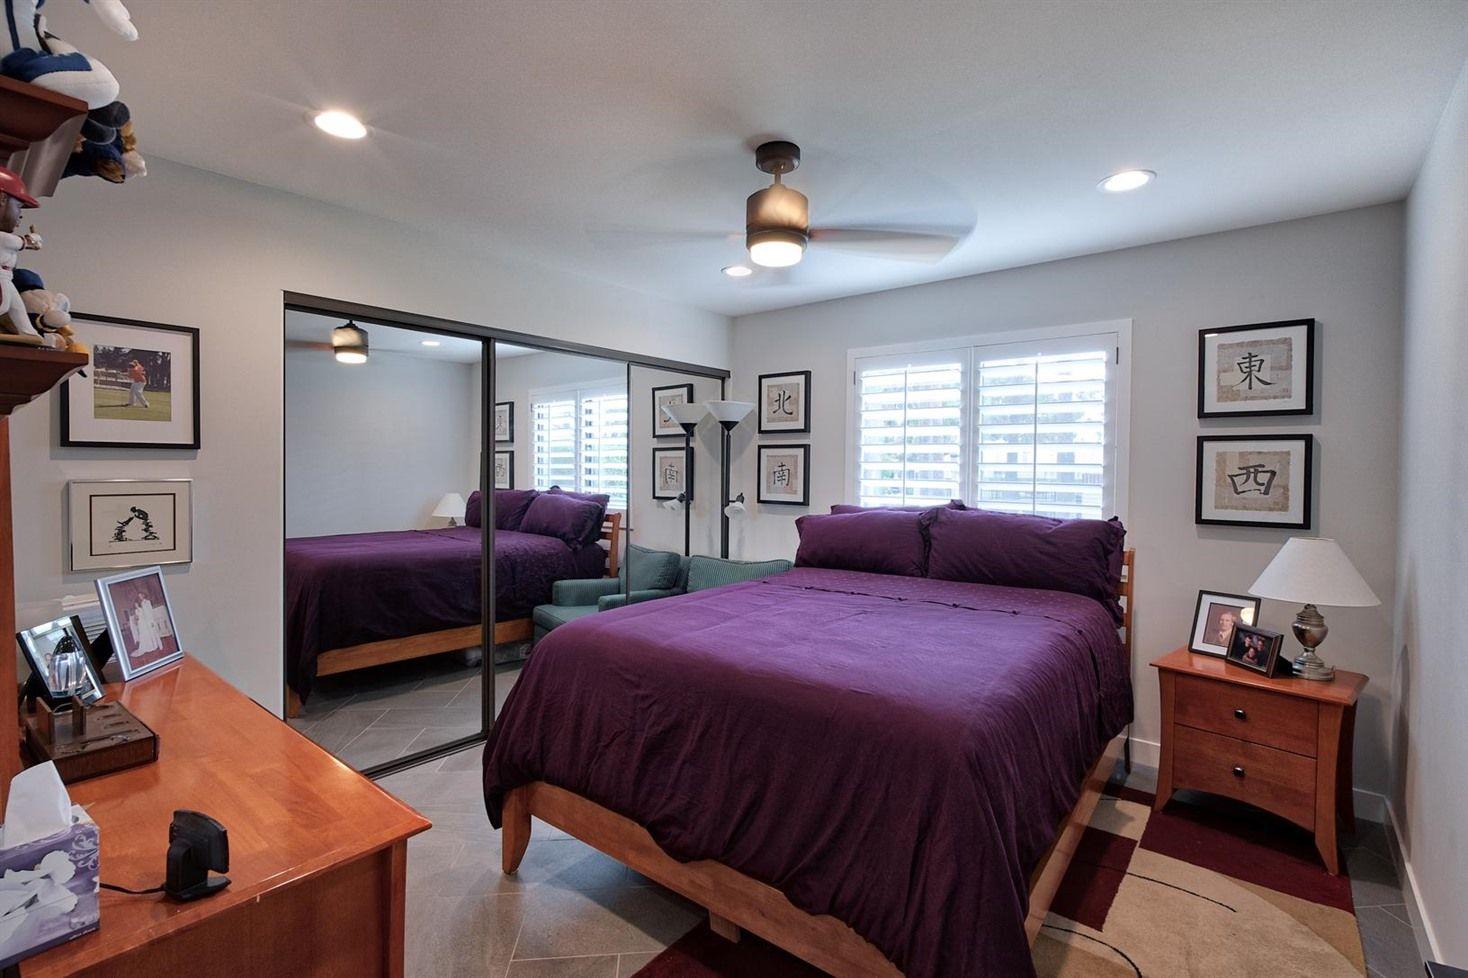 Bedroom Remodeling25 Brilliant Purple Bedroom Remodel